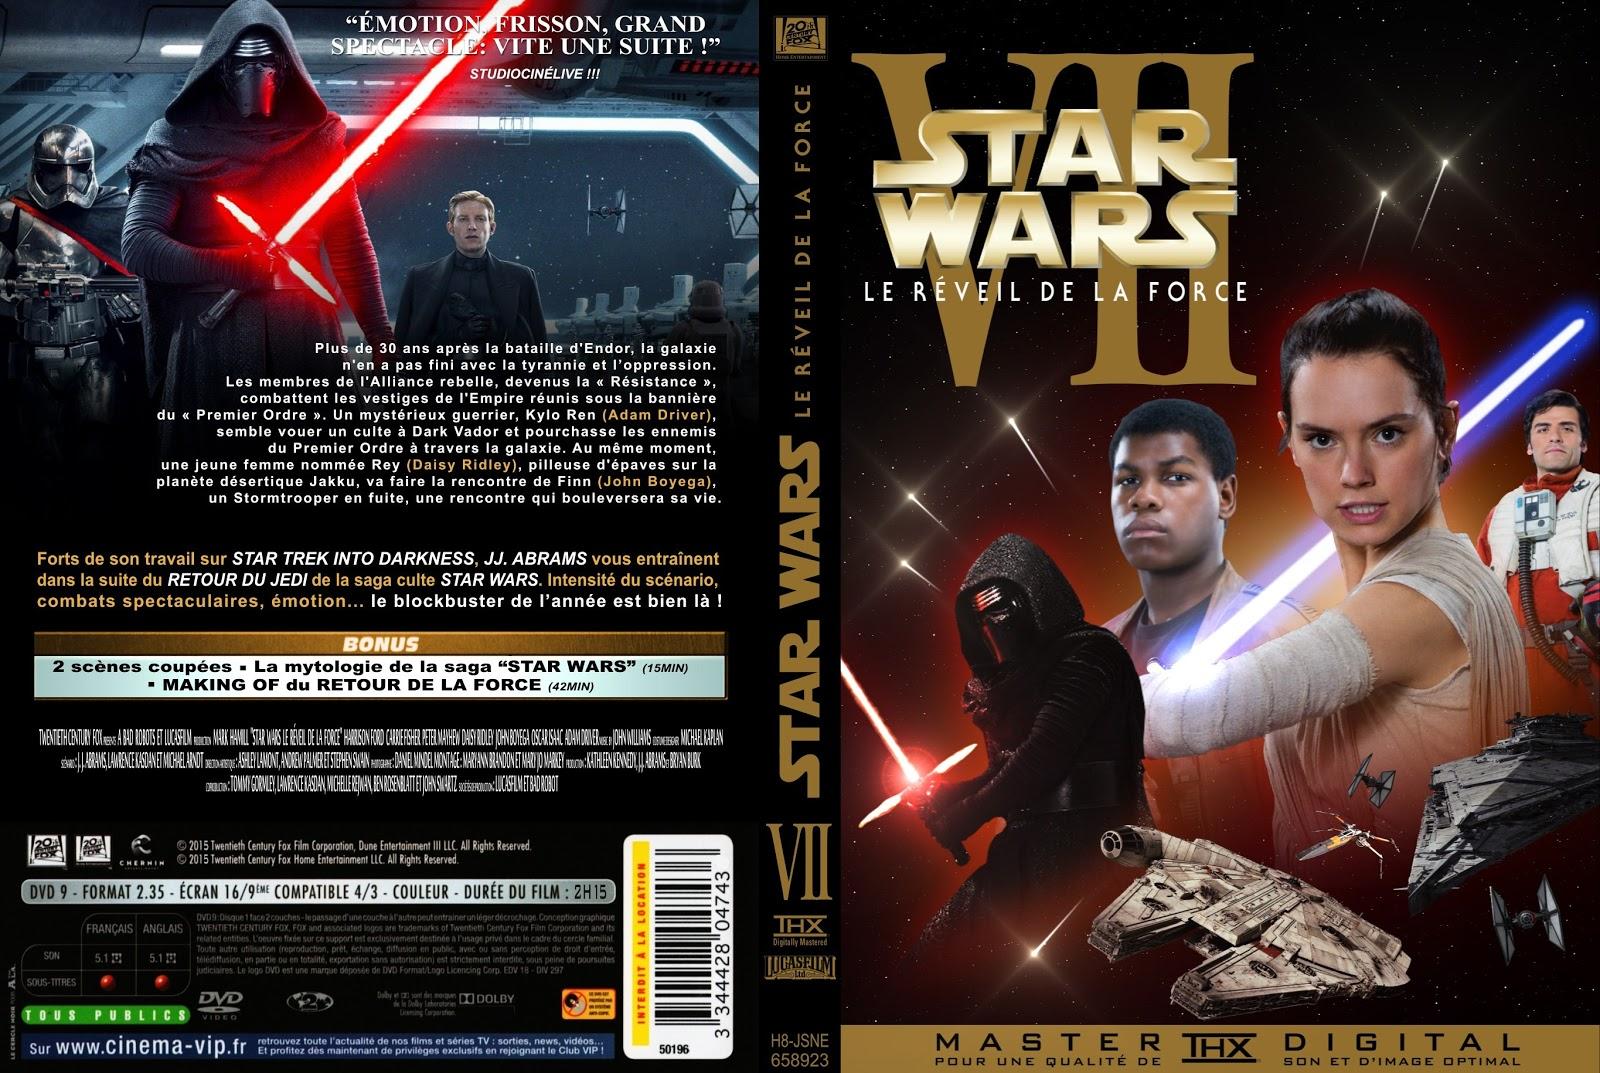 star wars episode 7 wallpaper 4k